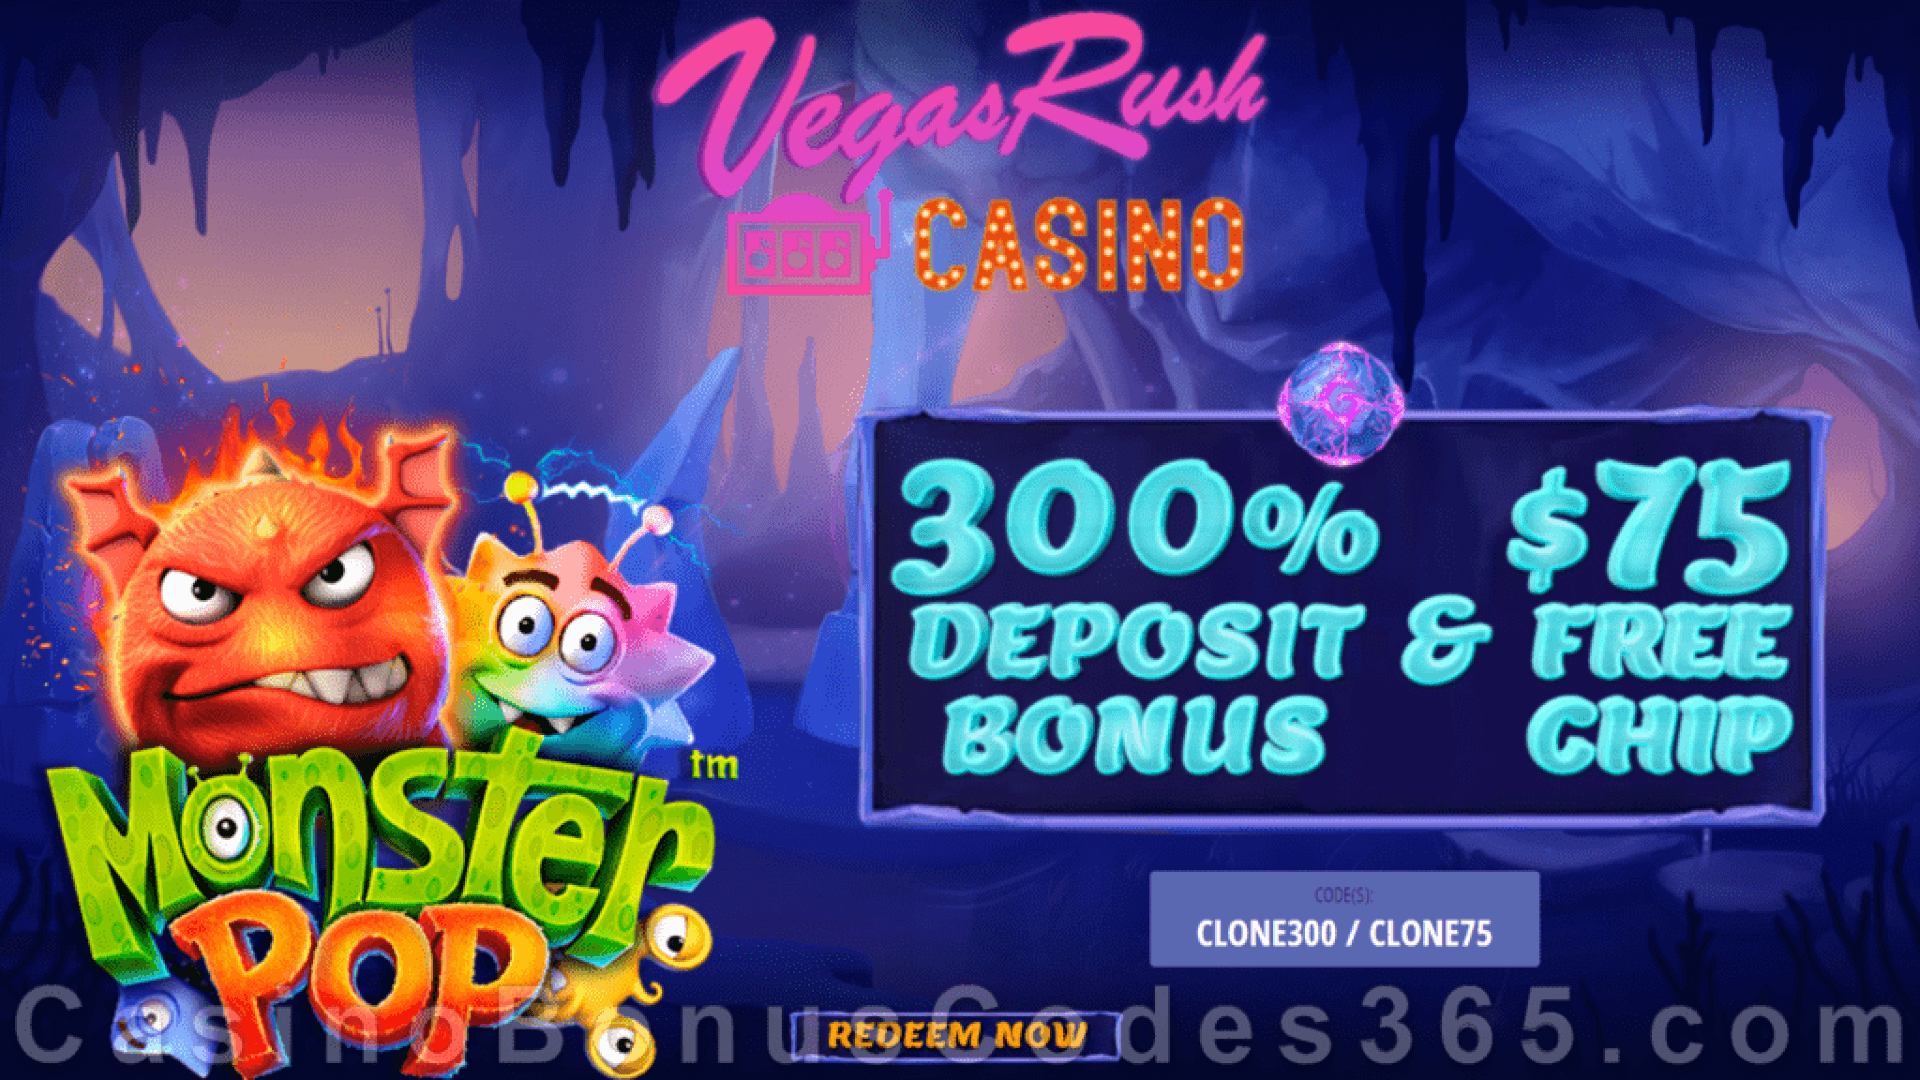 Vegas Rush Casino 300% Match plus $75 FREE Chip Special Bonus Pack Betsoft Monster Pop